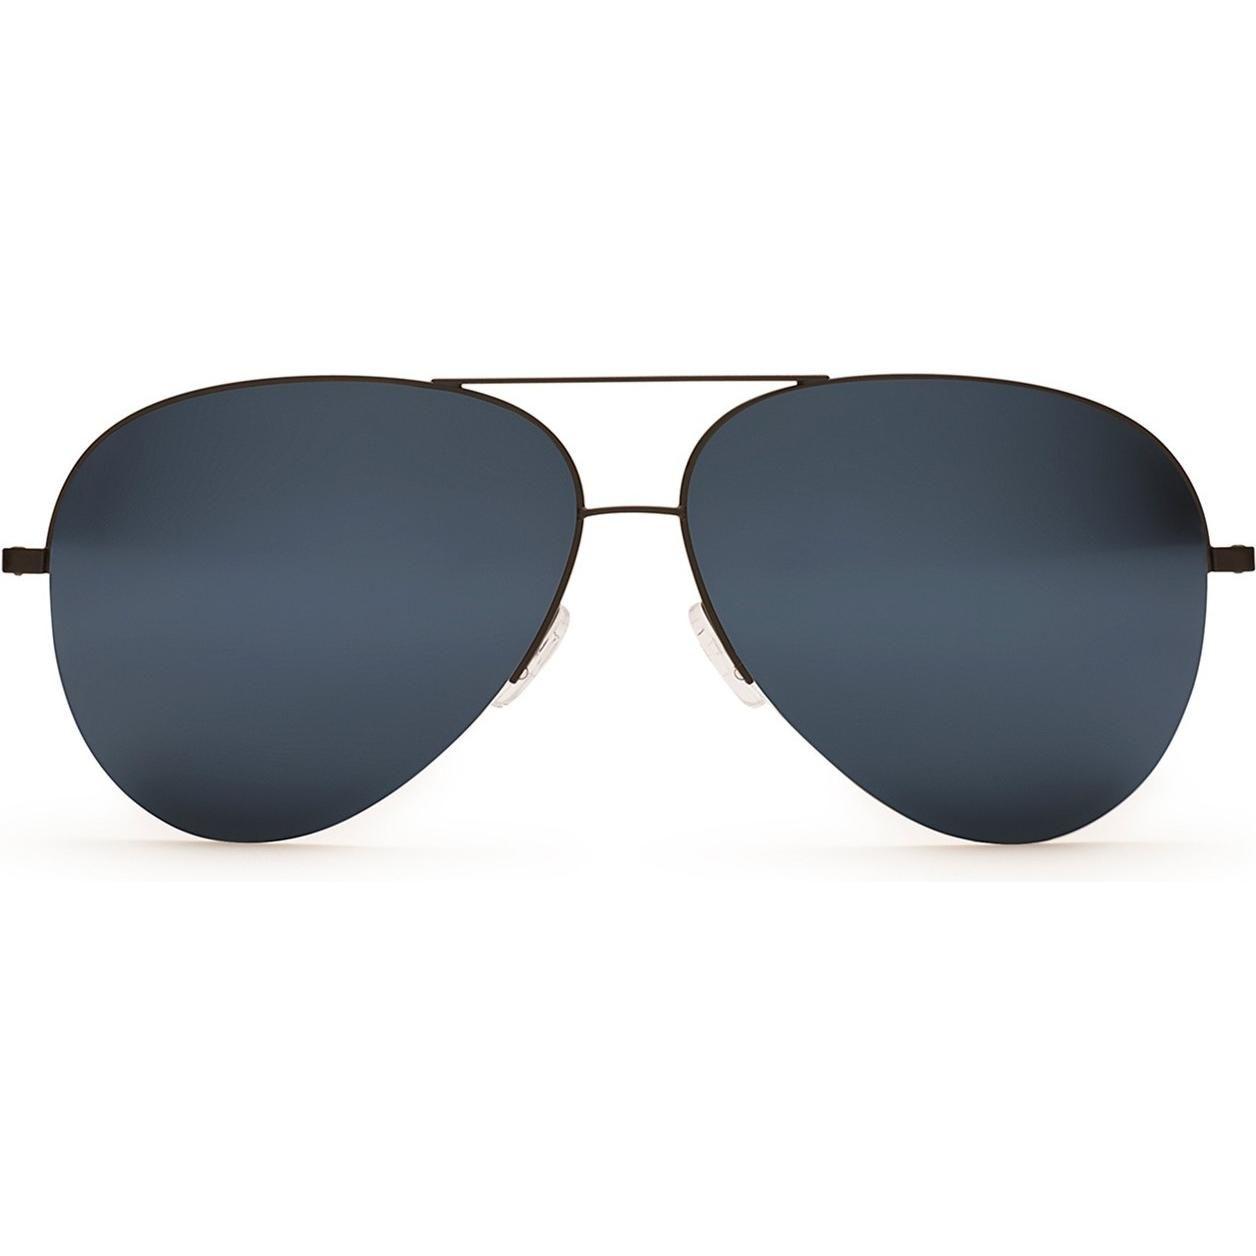 17fc4f623c Victoria Beckham Classic Victoria Galaxy Sunglasses as seen on Eva Longoria